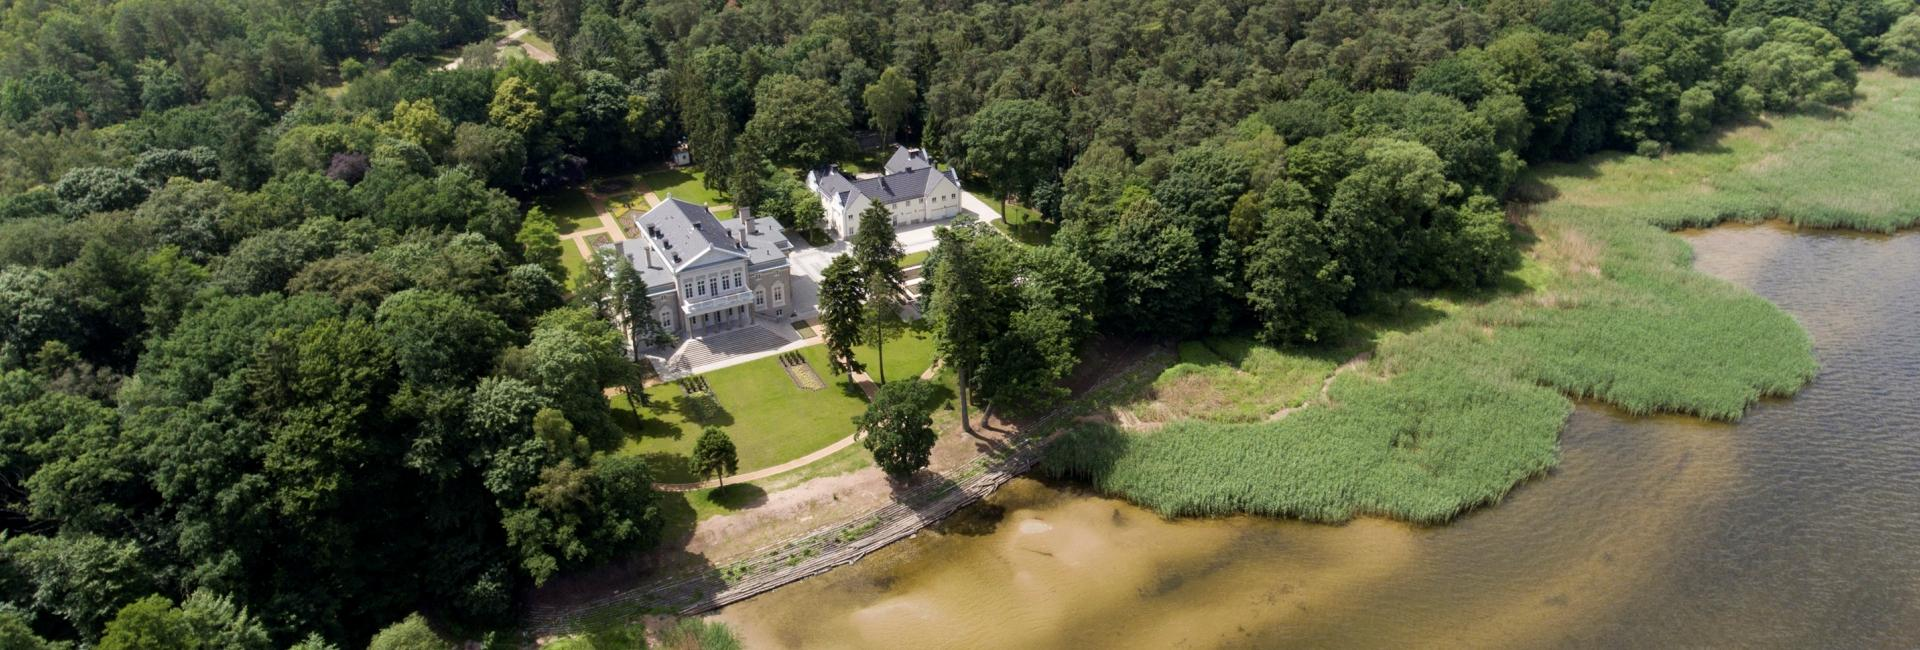 Manowce Palace in Poland